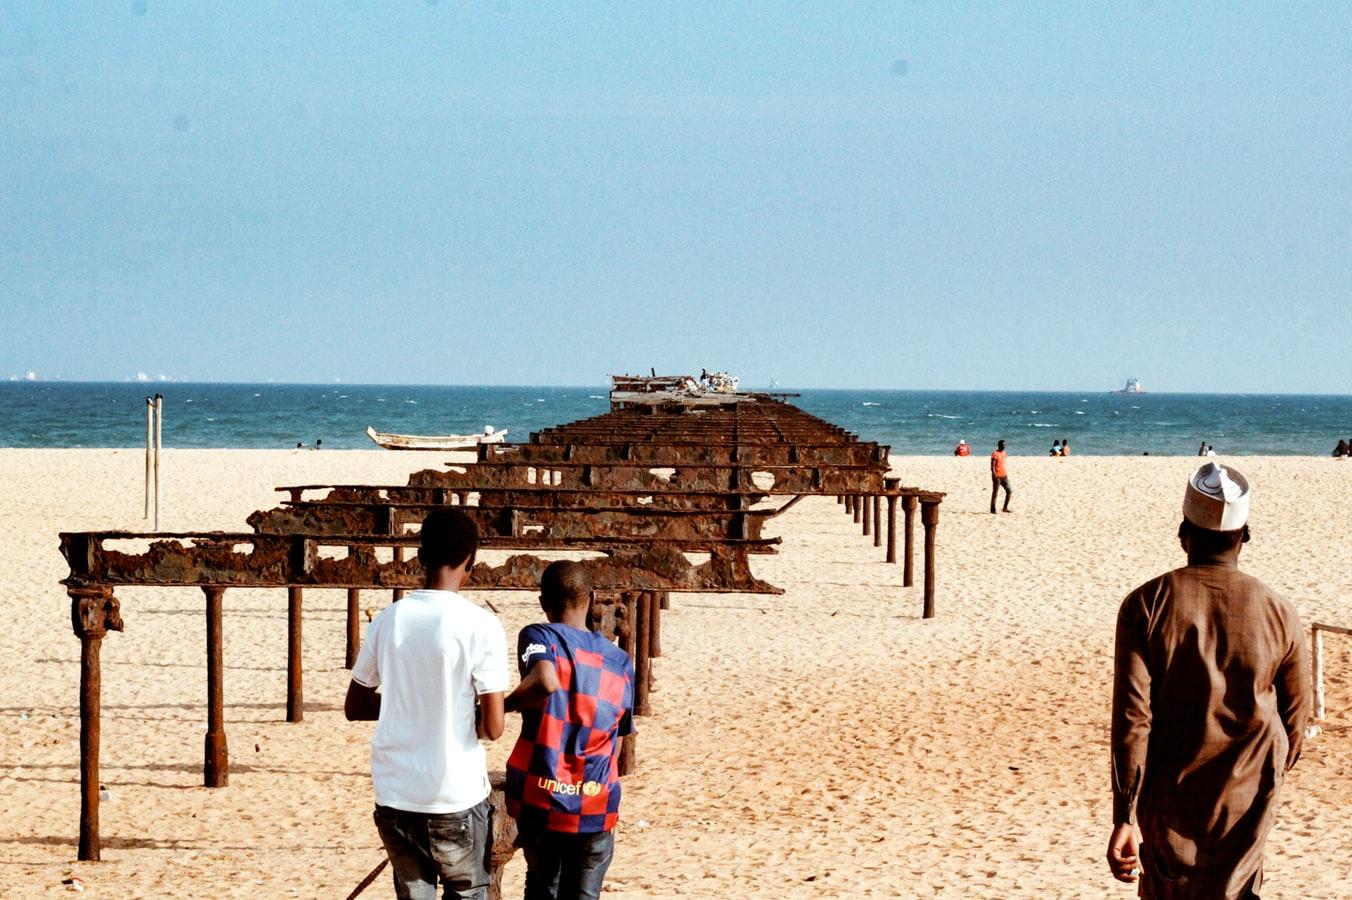 Rostiger Pier am Strand in Togo